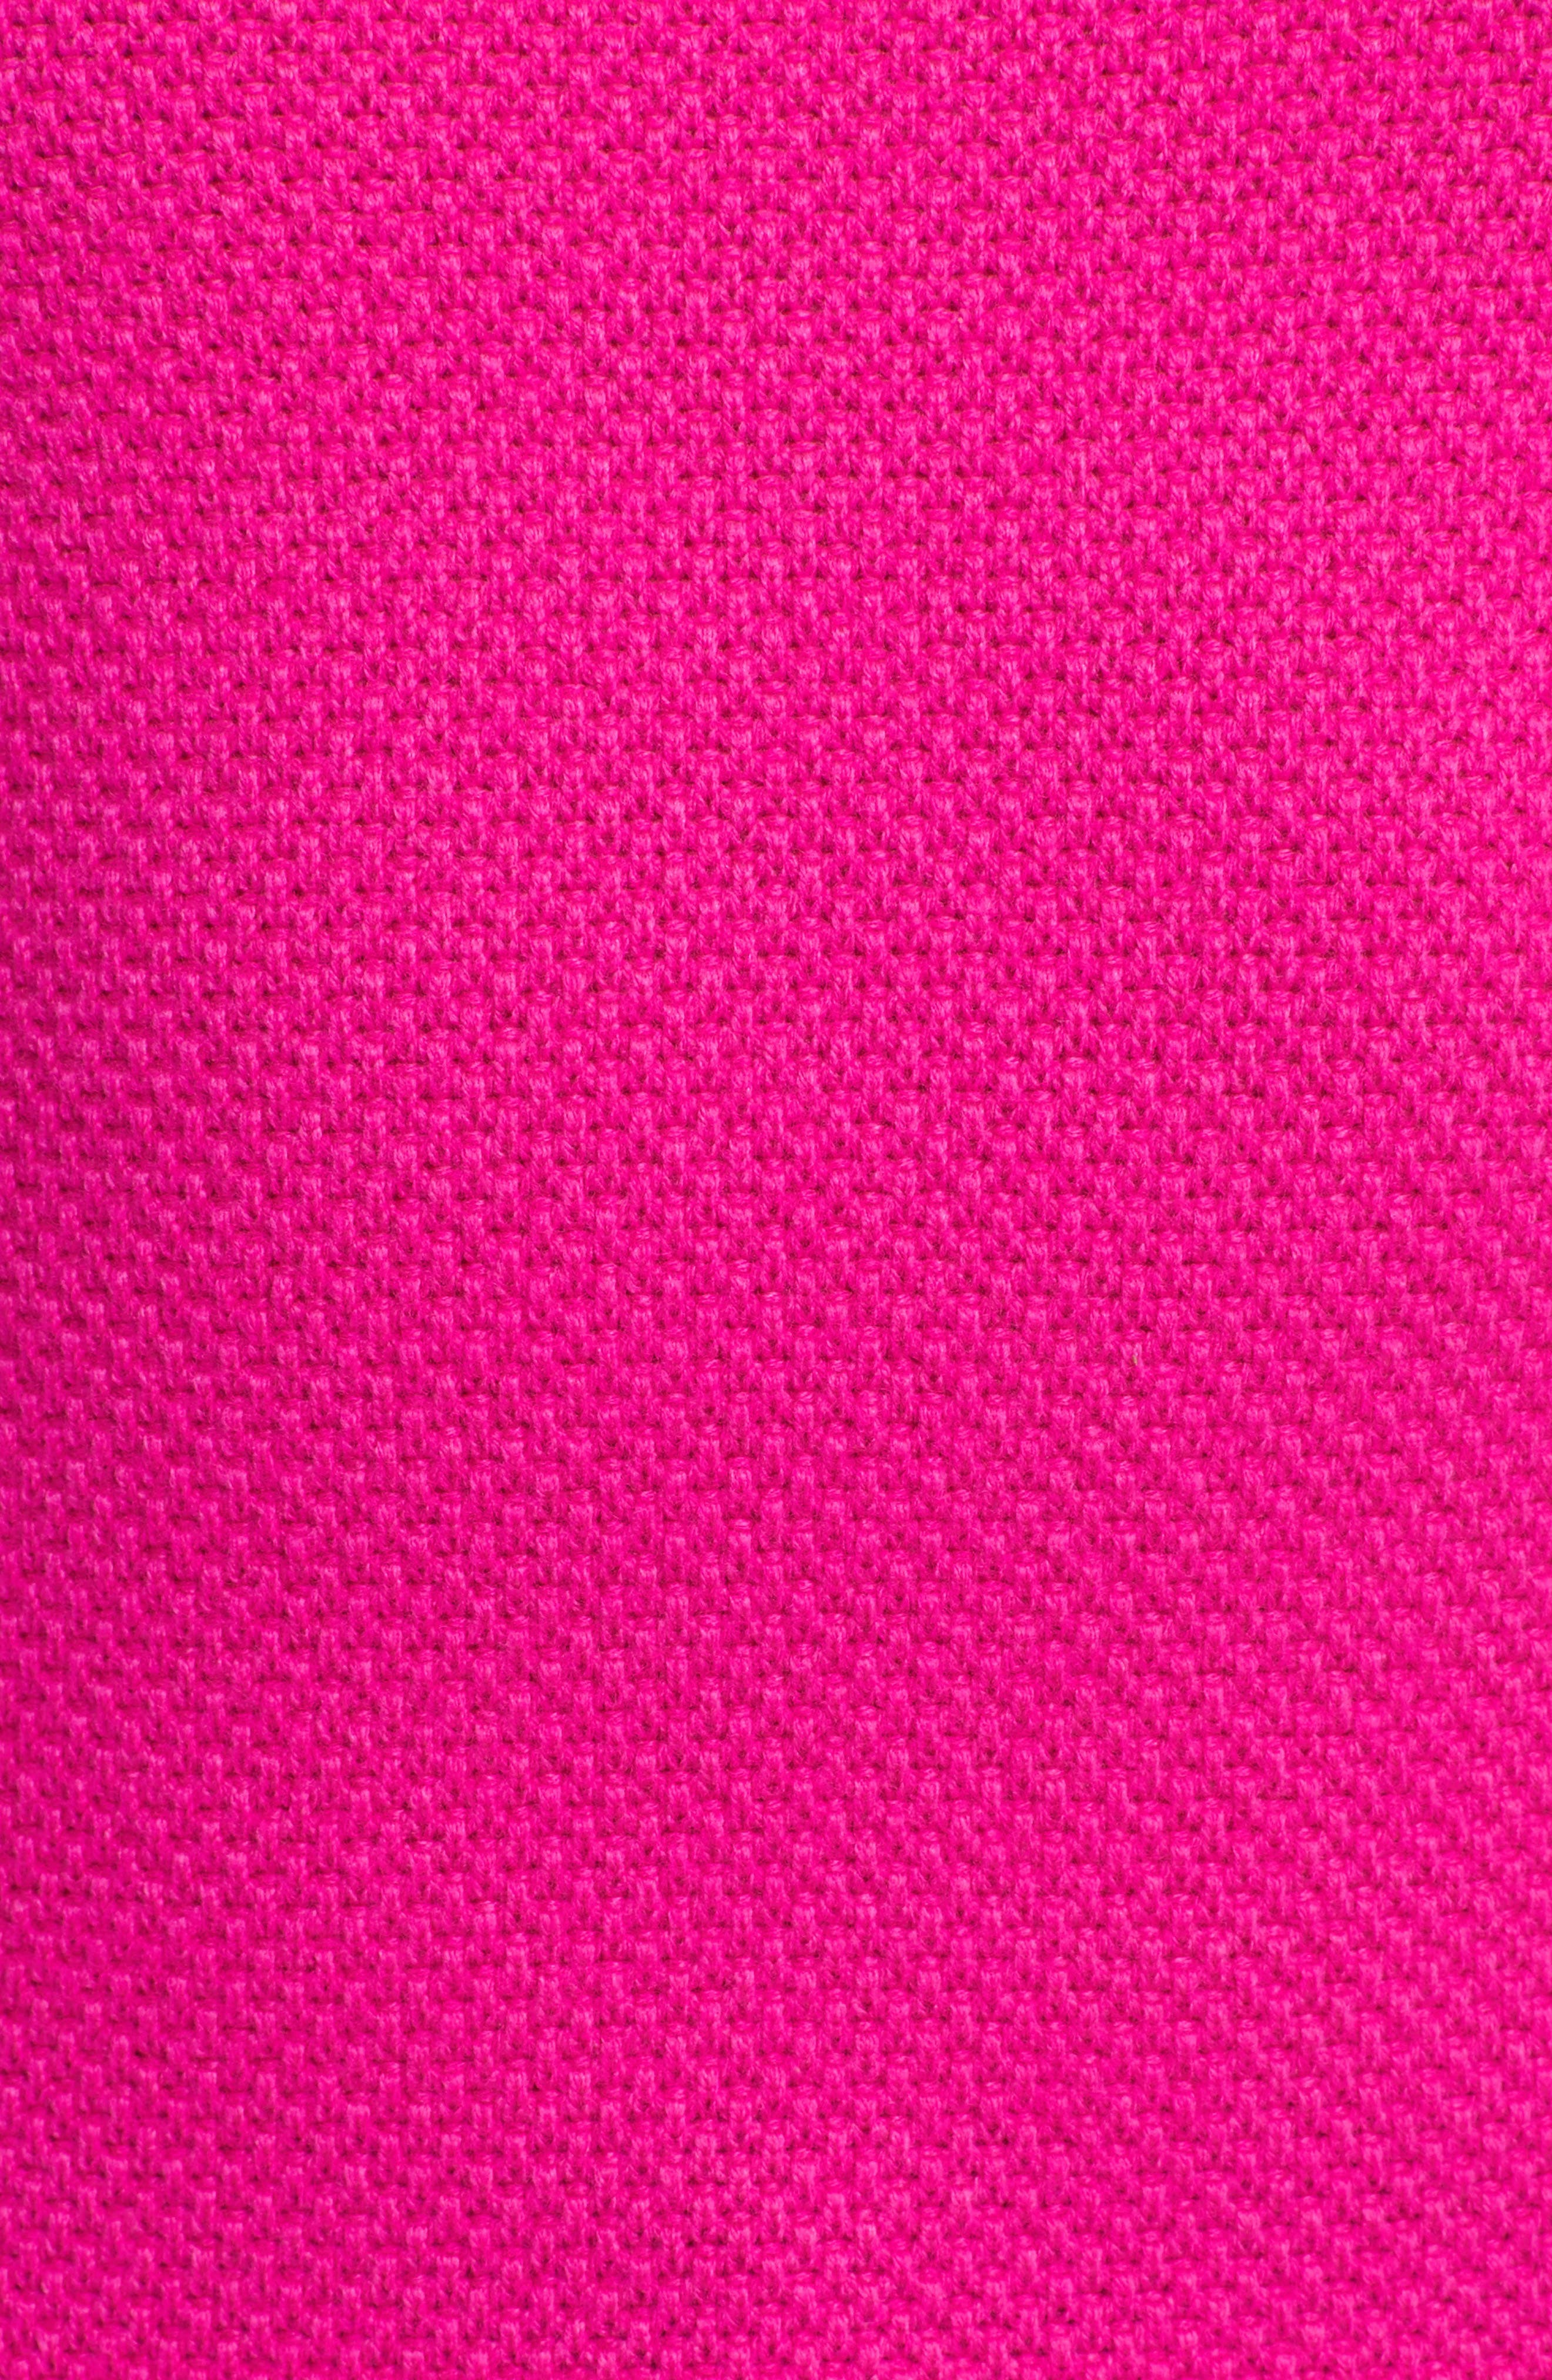 Textured Merino-Wool-Blend Sweater,                             Alternate thumbnail 5, color,